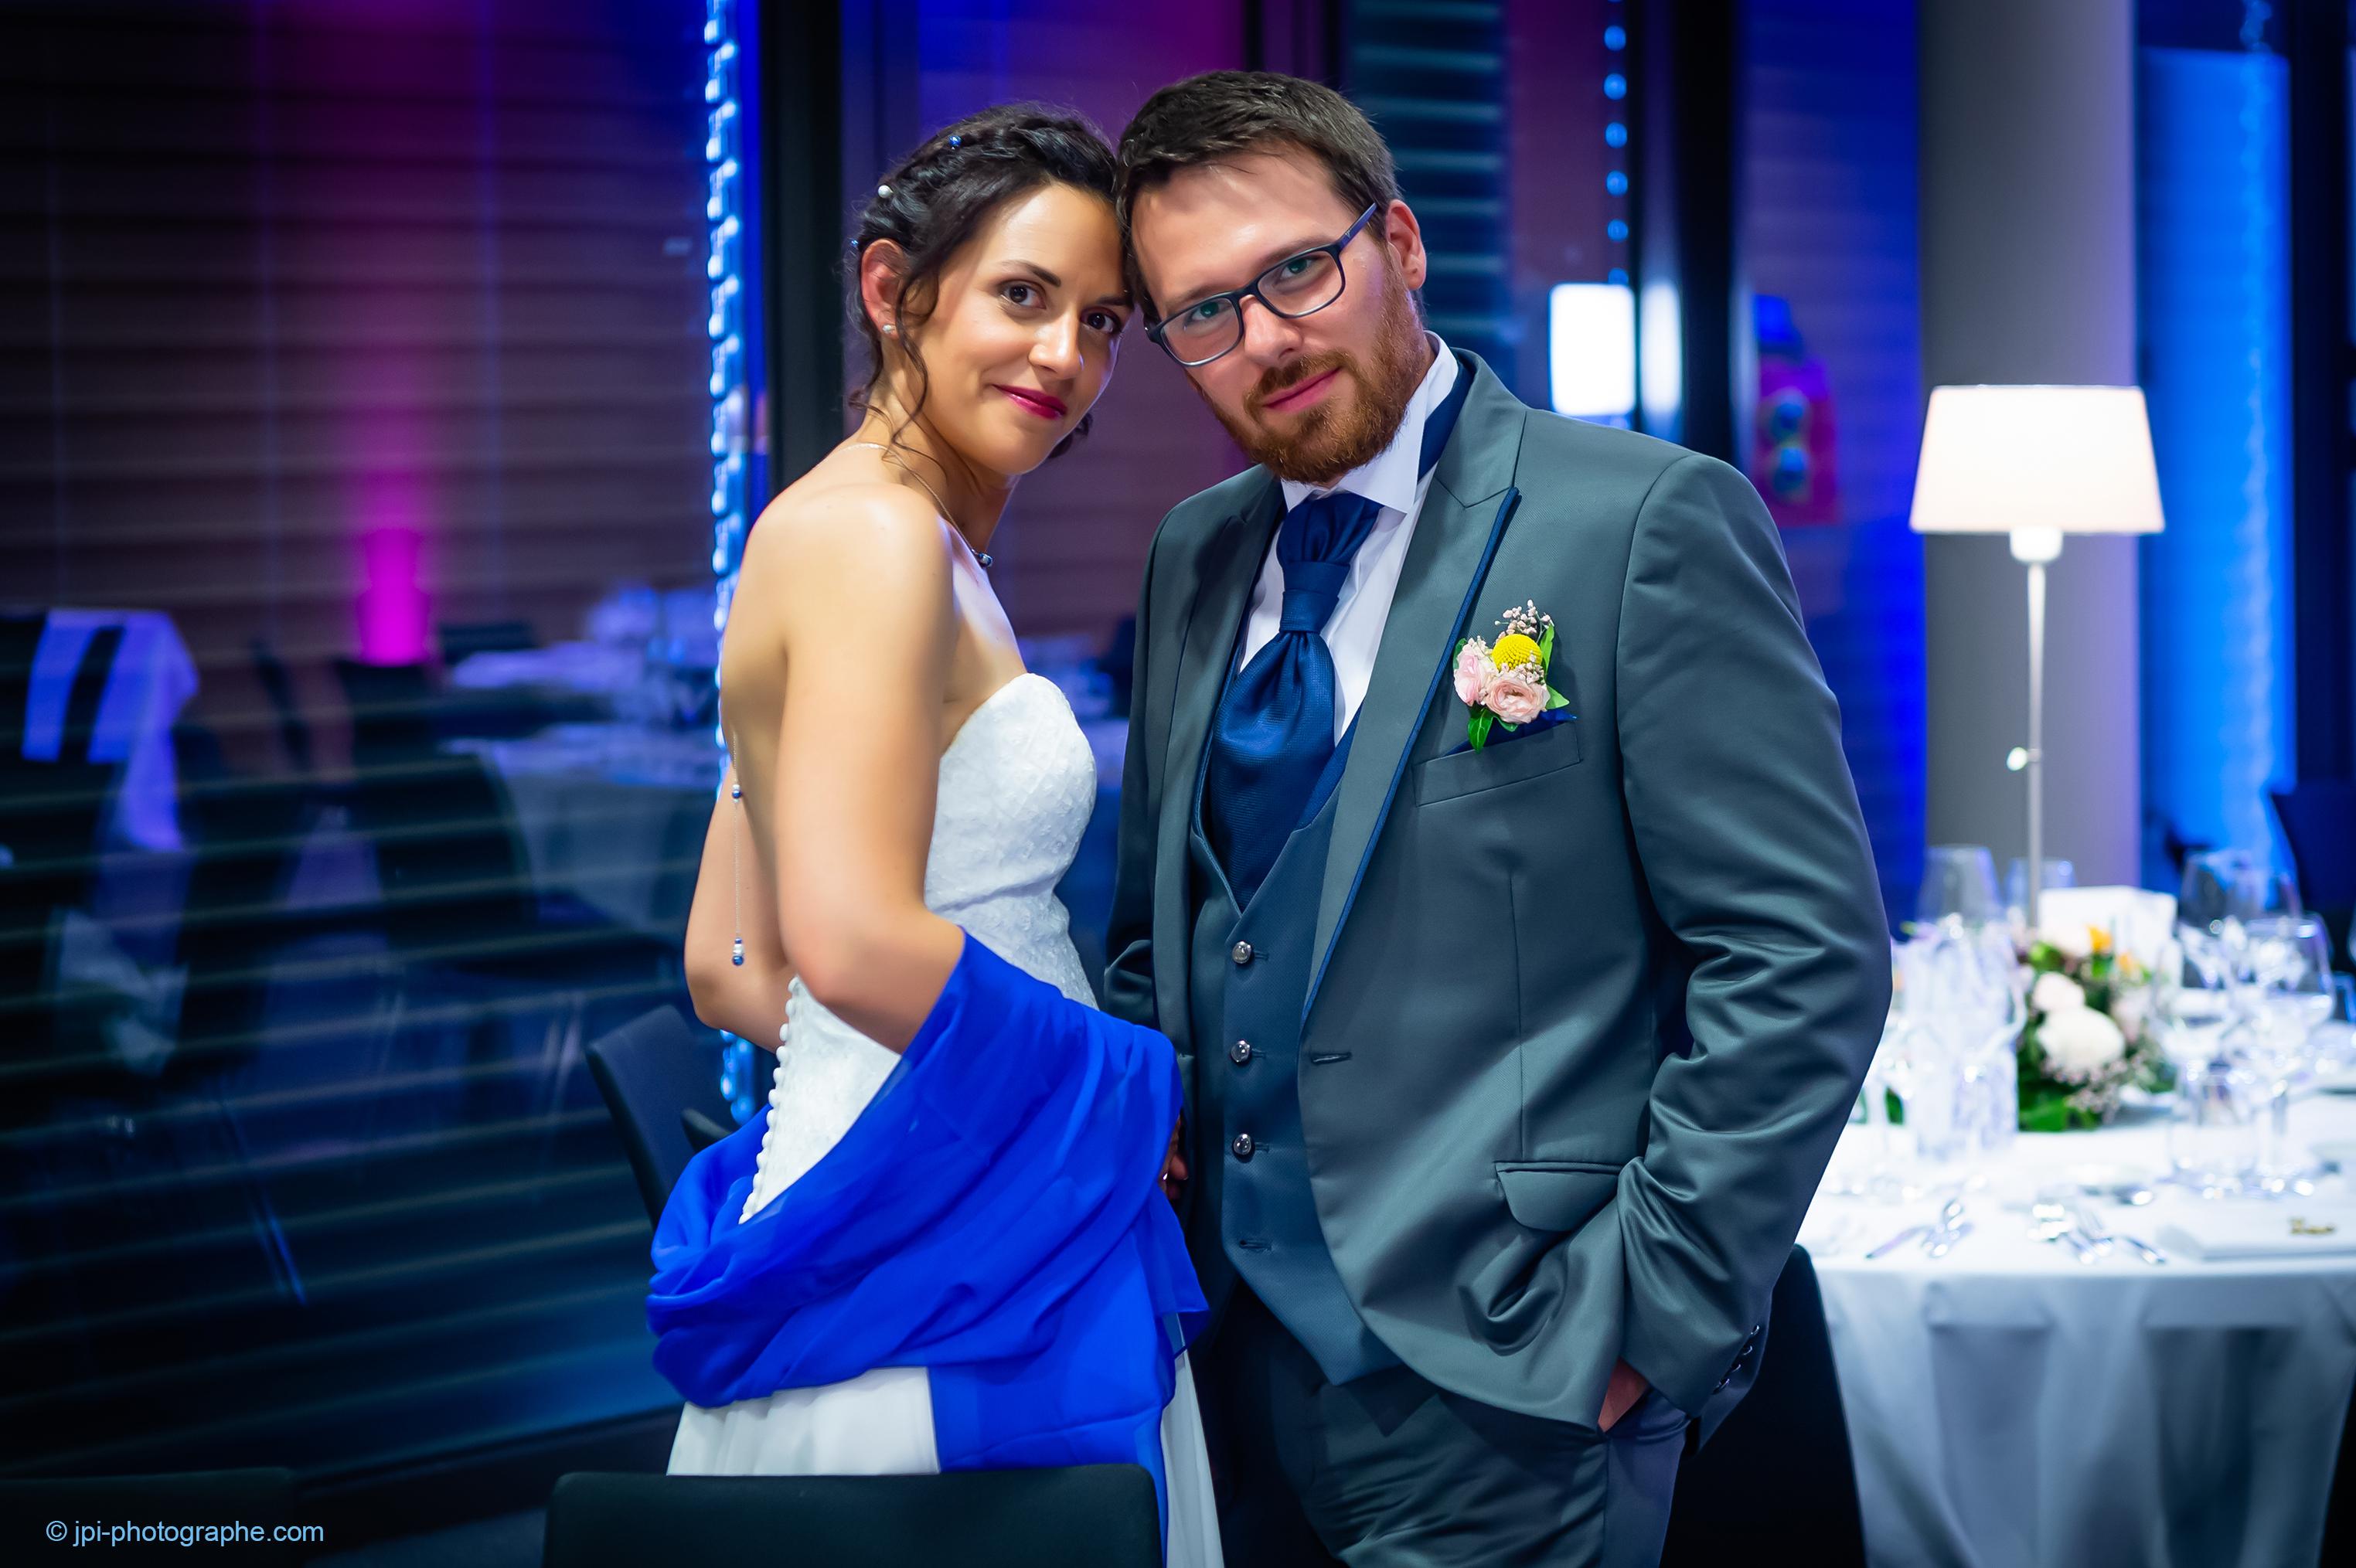 portrait mariage- photographe Mulhouse Alalsace